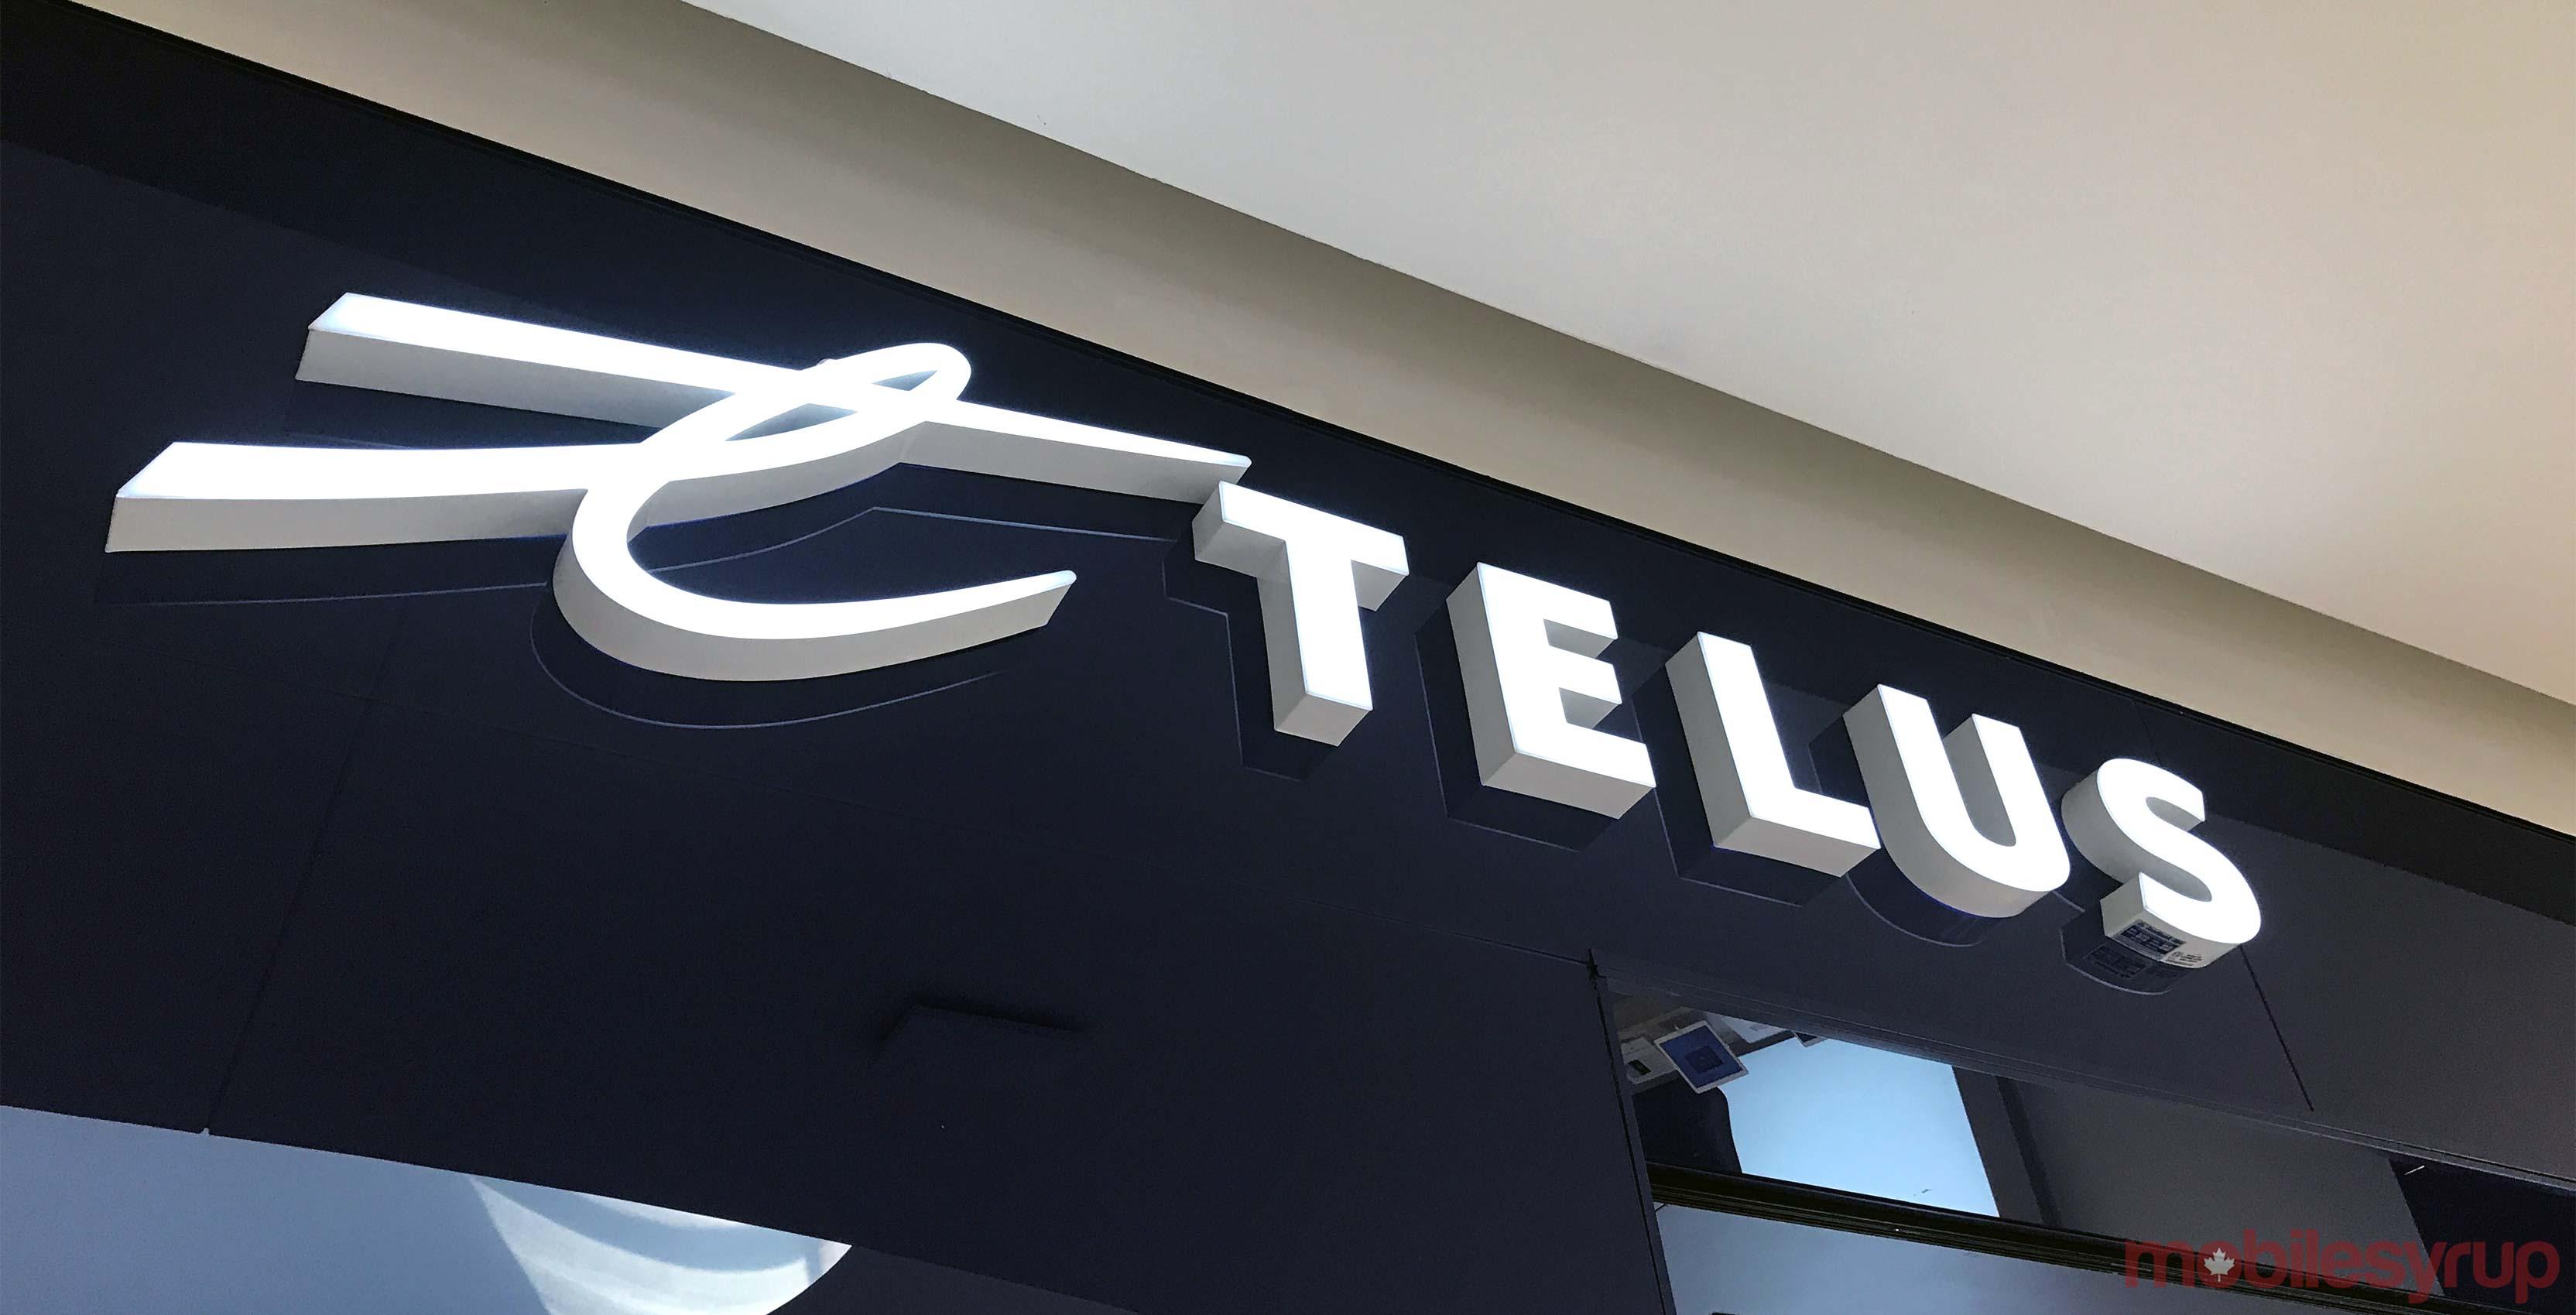 Telus logo on wall